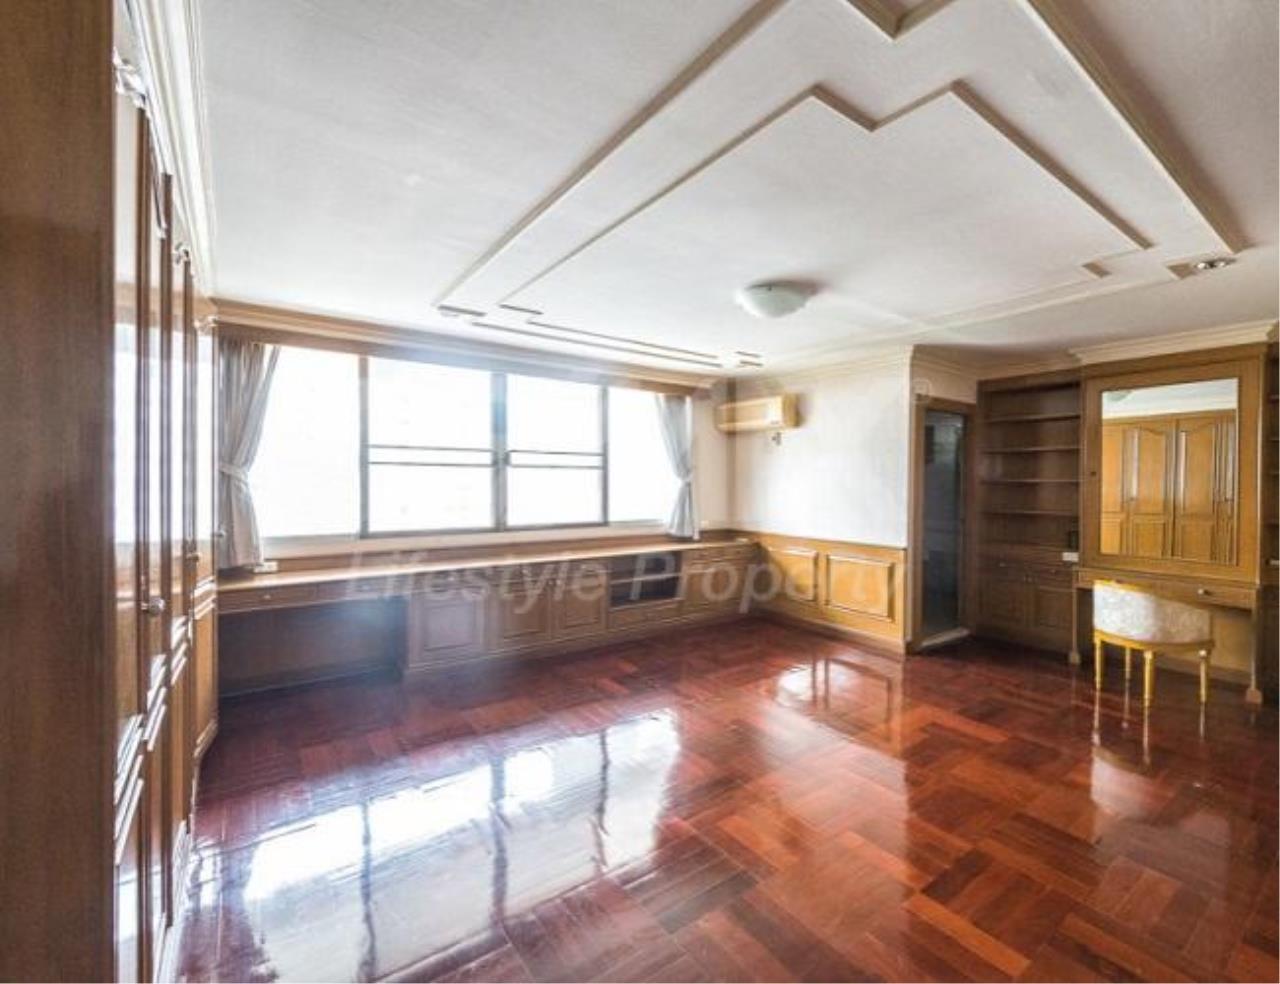 RE/MAX LifeStyle Property Agency's D.S. Tower 1 Sukhumvit 33 8